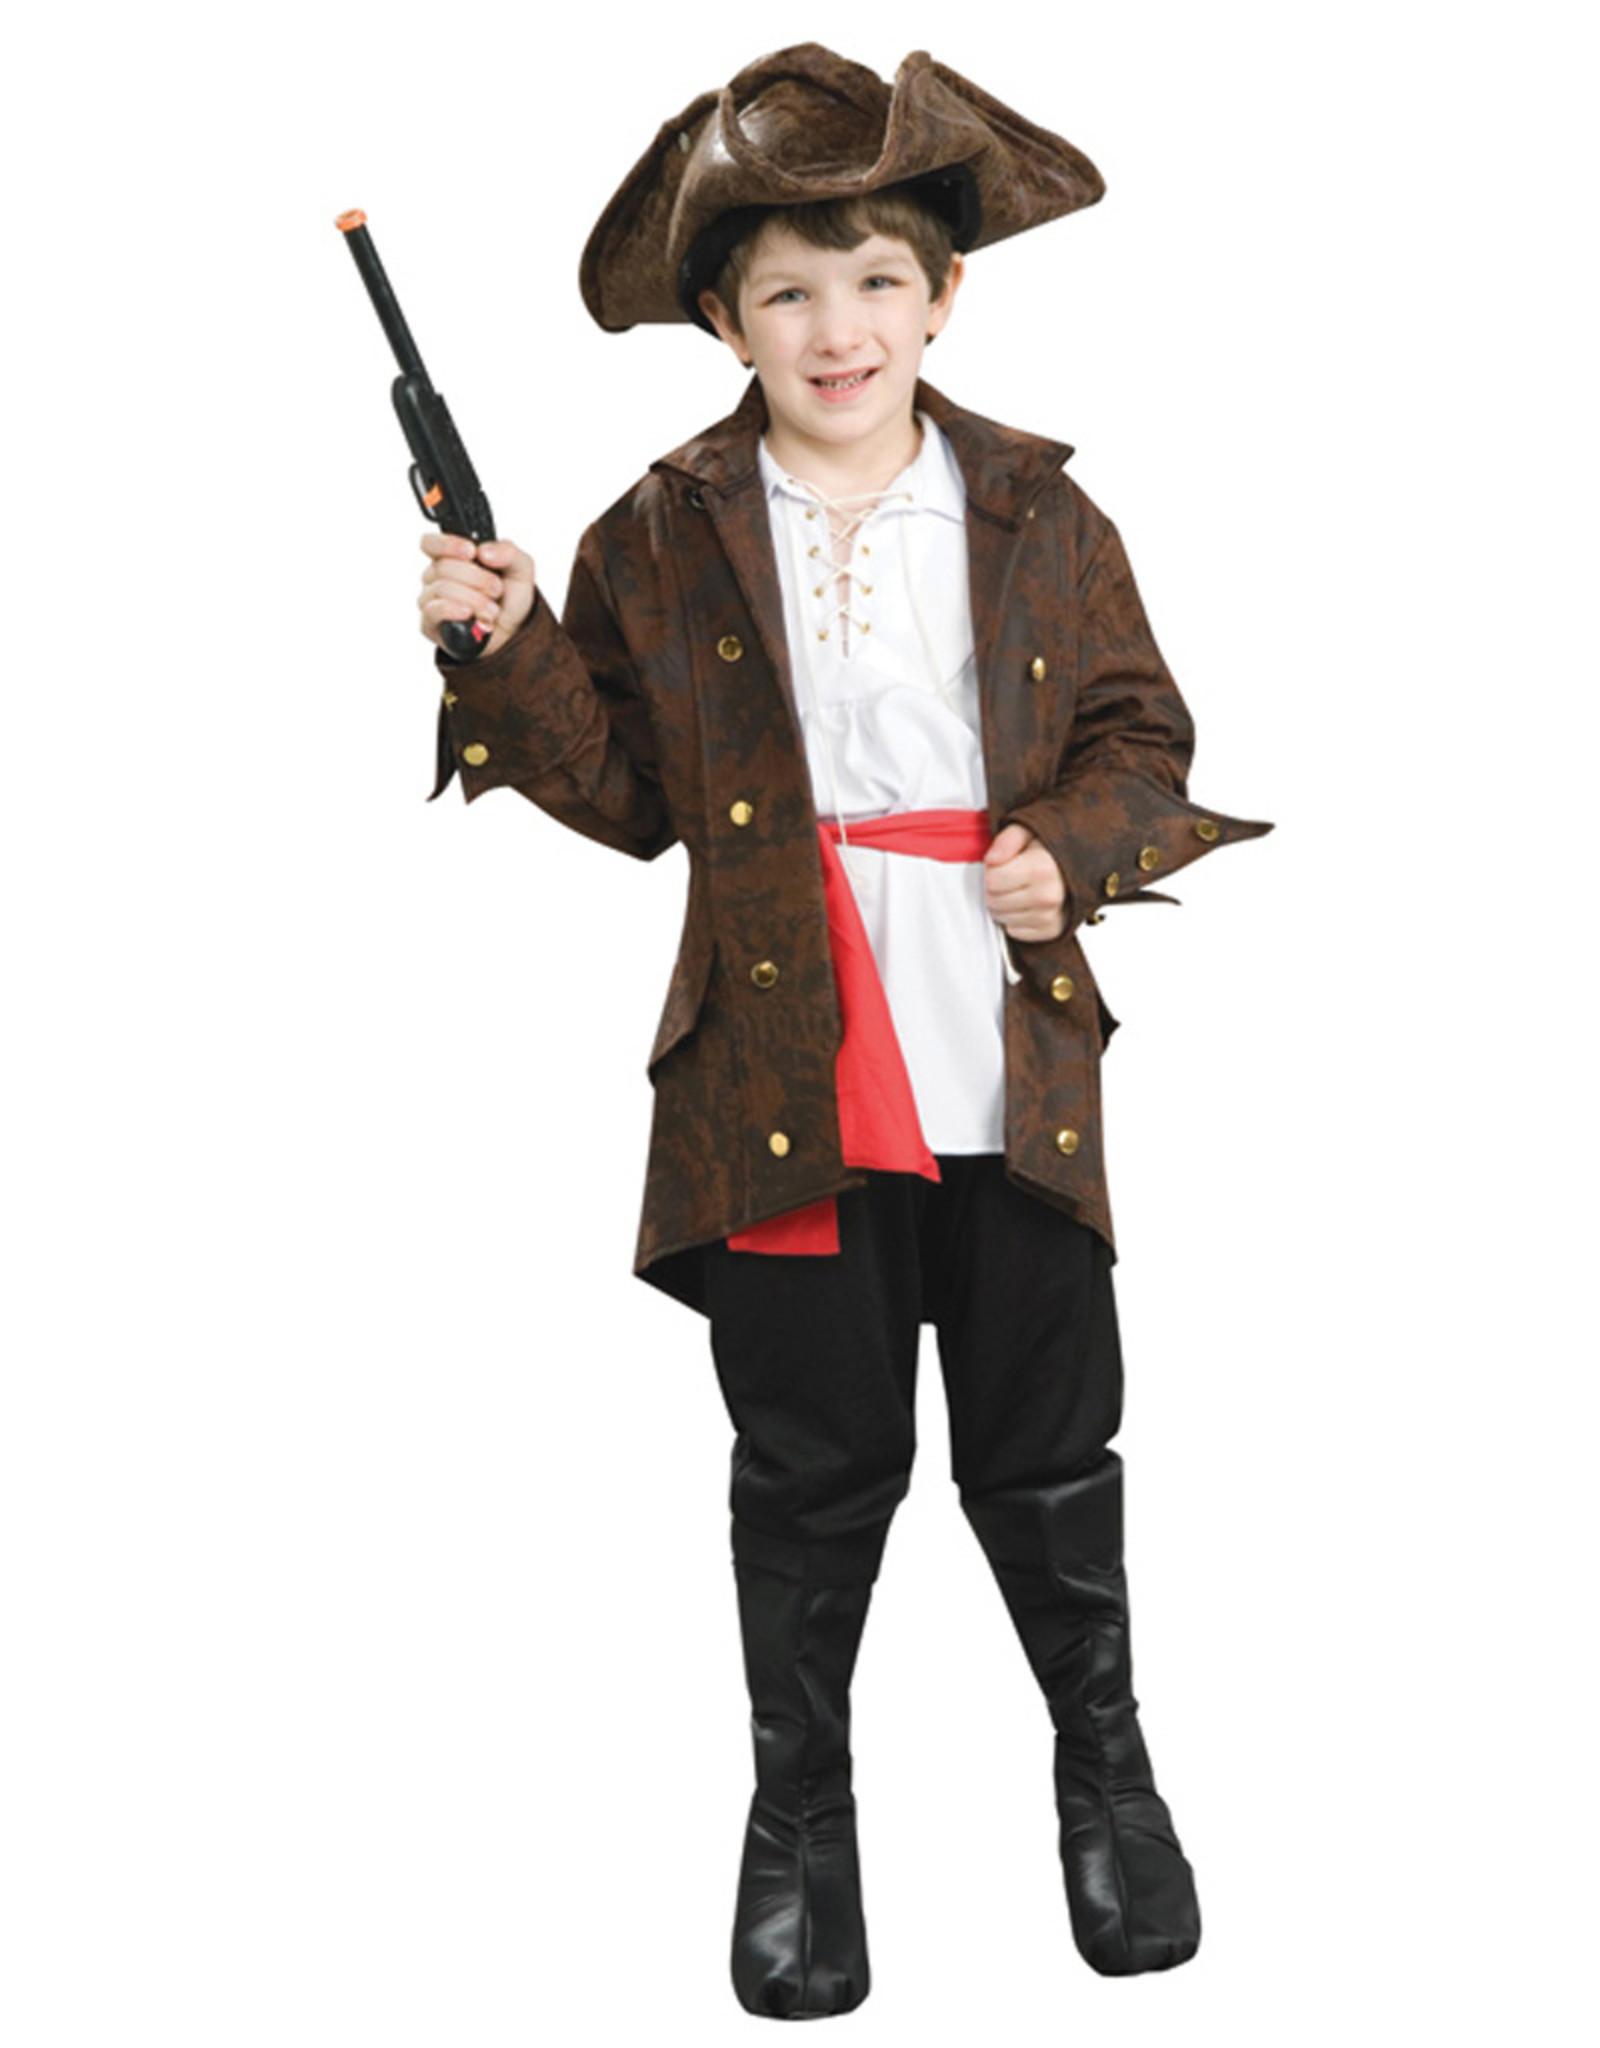 High Seas Pirate Costume - Boys